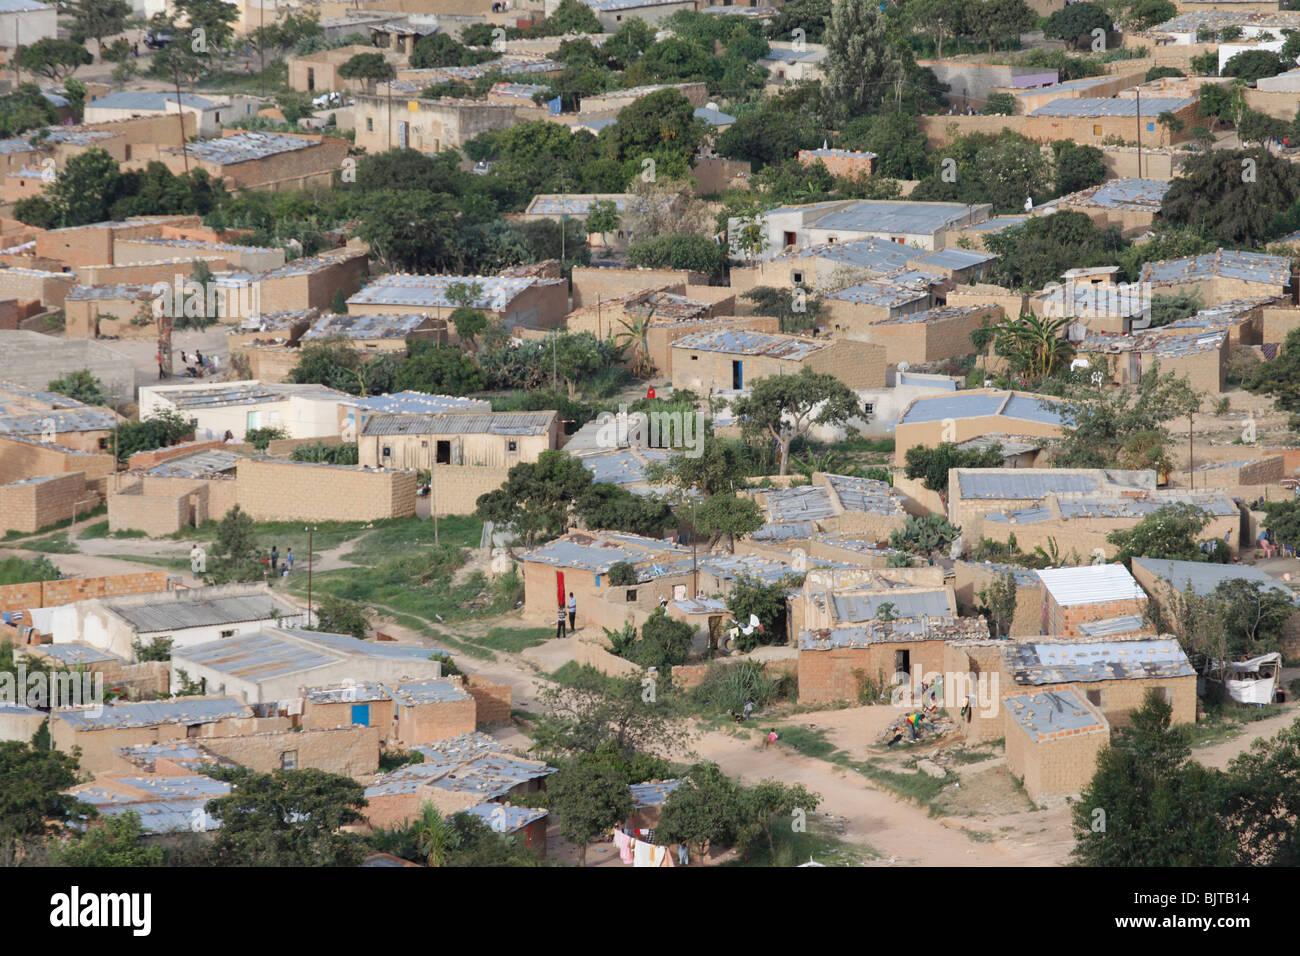 Views of barrios in Lubango city. Huila Province, Angola. Africa. - Stock Image